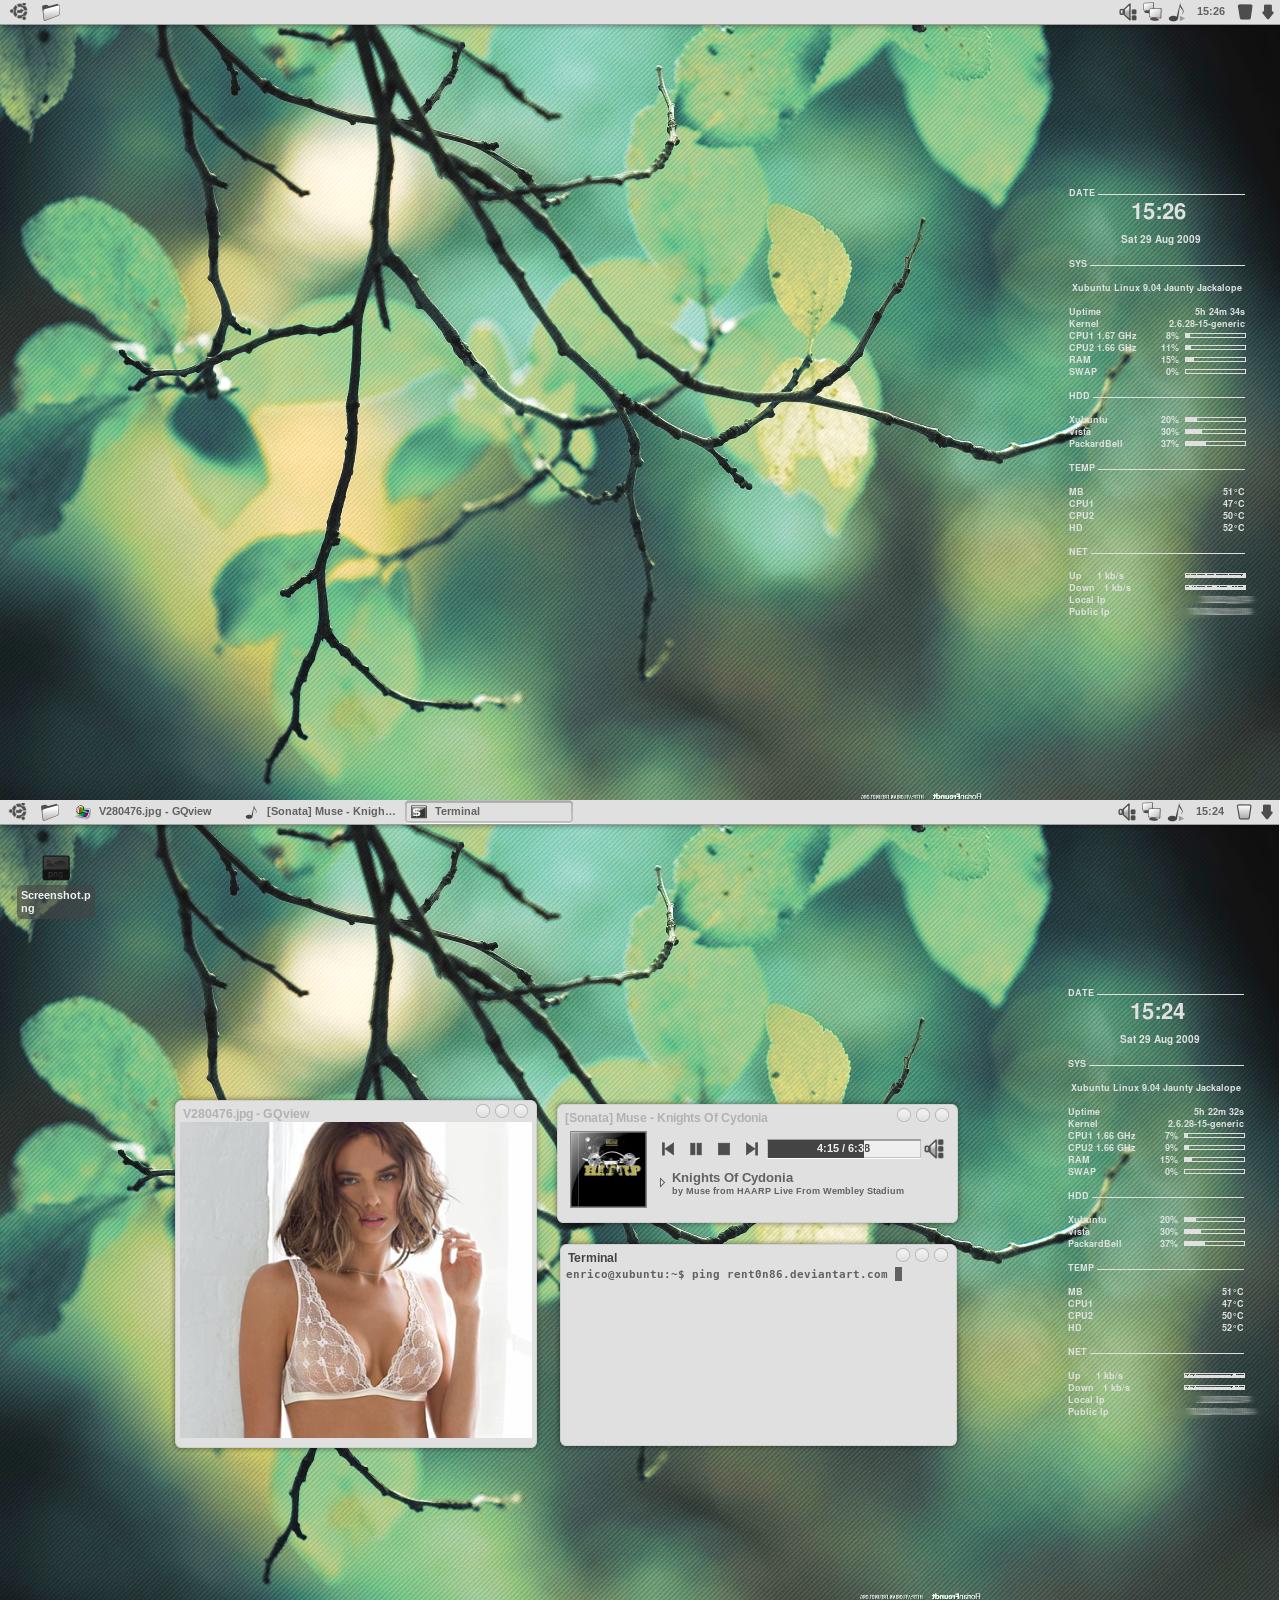 August 2009 Xfce Desktop by rent0n86